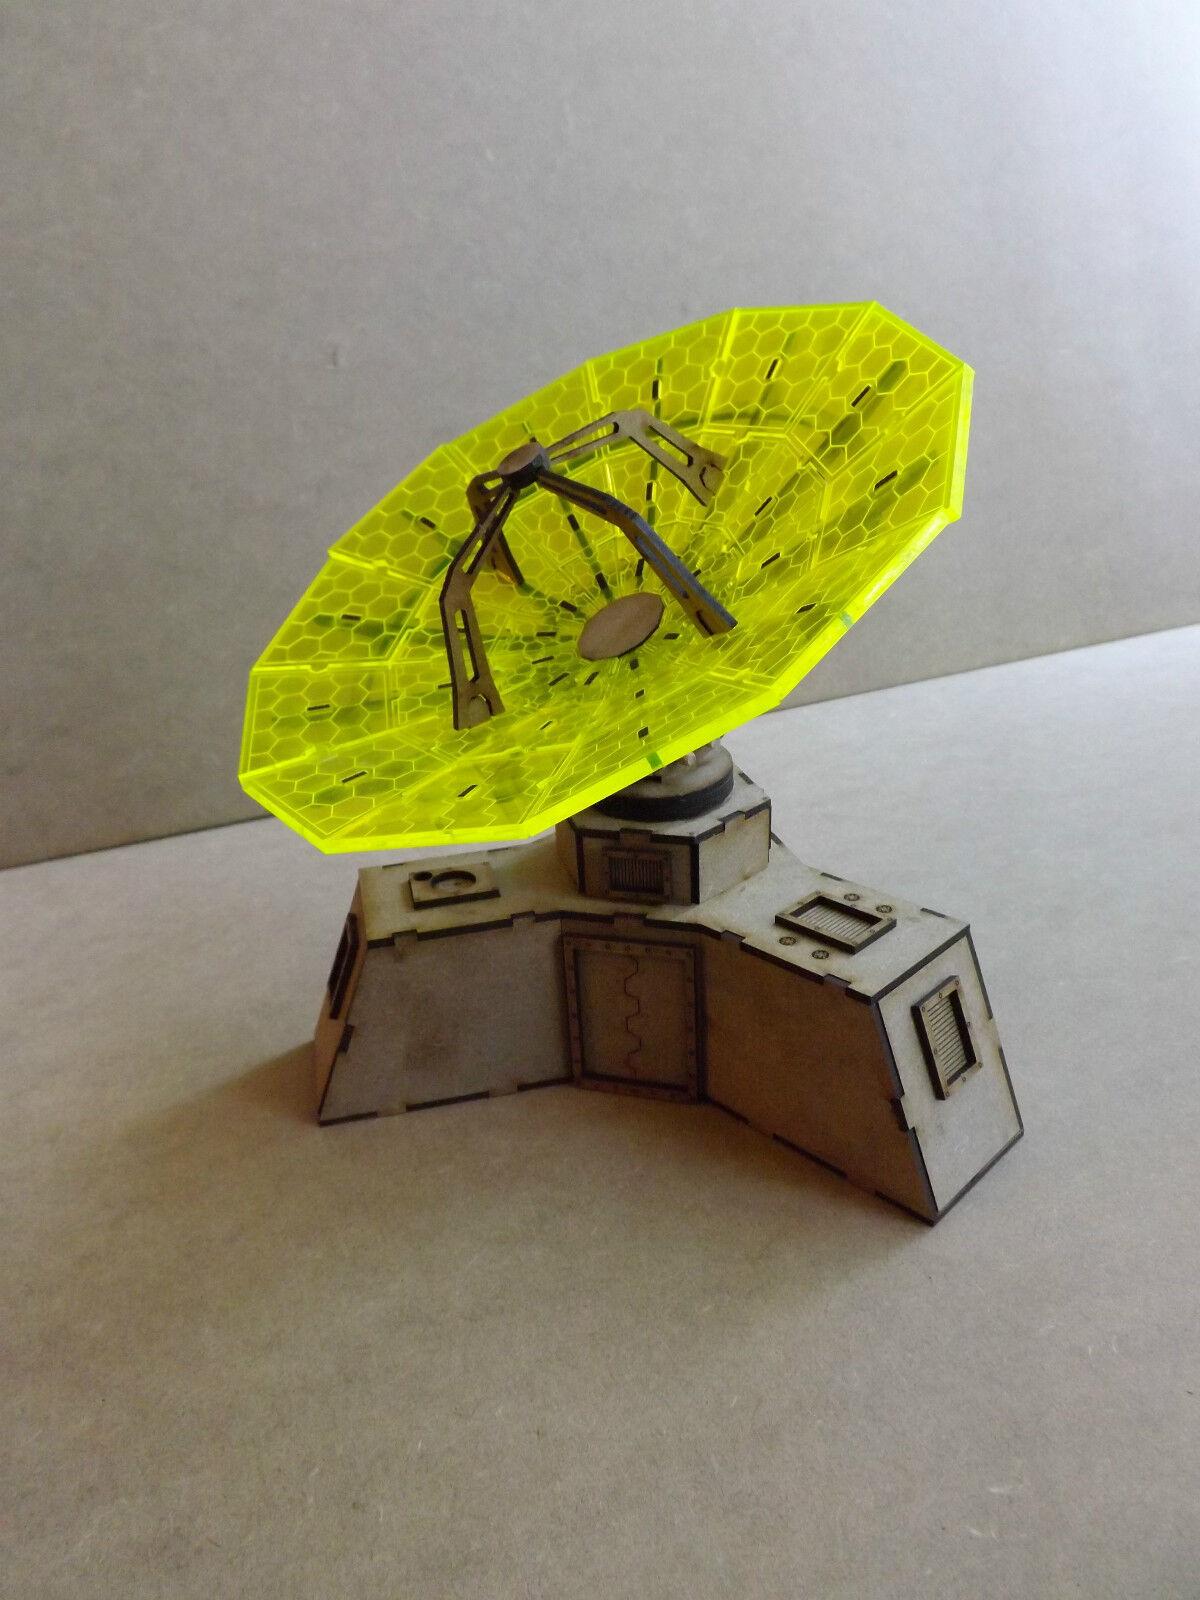 Satallite Dish LED warhammer 40k wargame infinity building terrain scenary